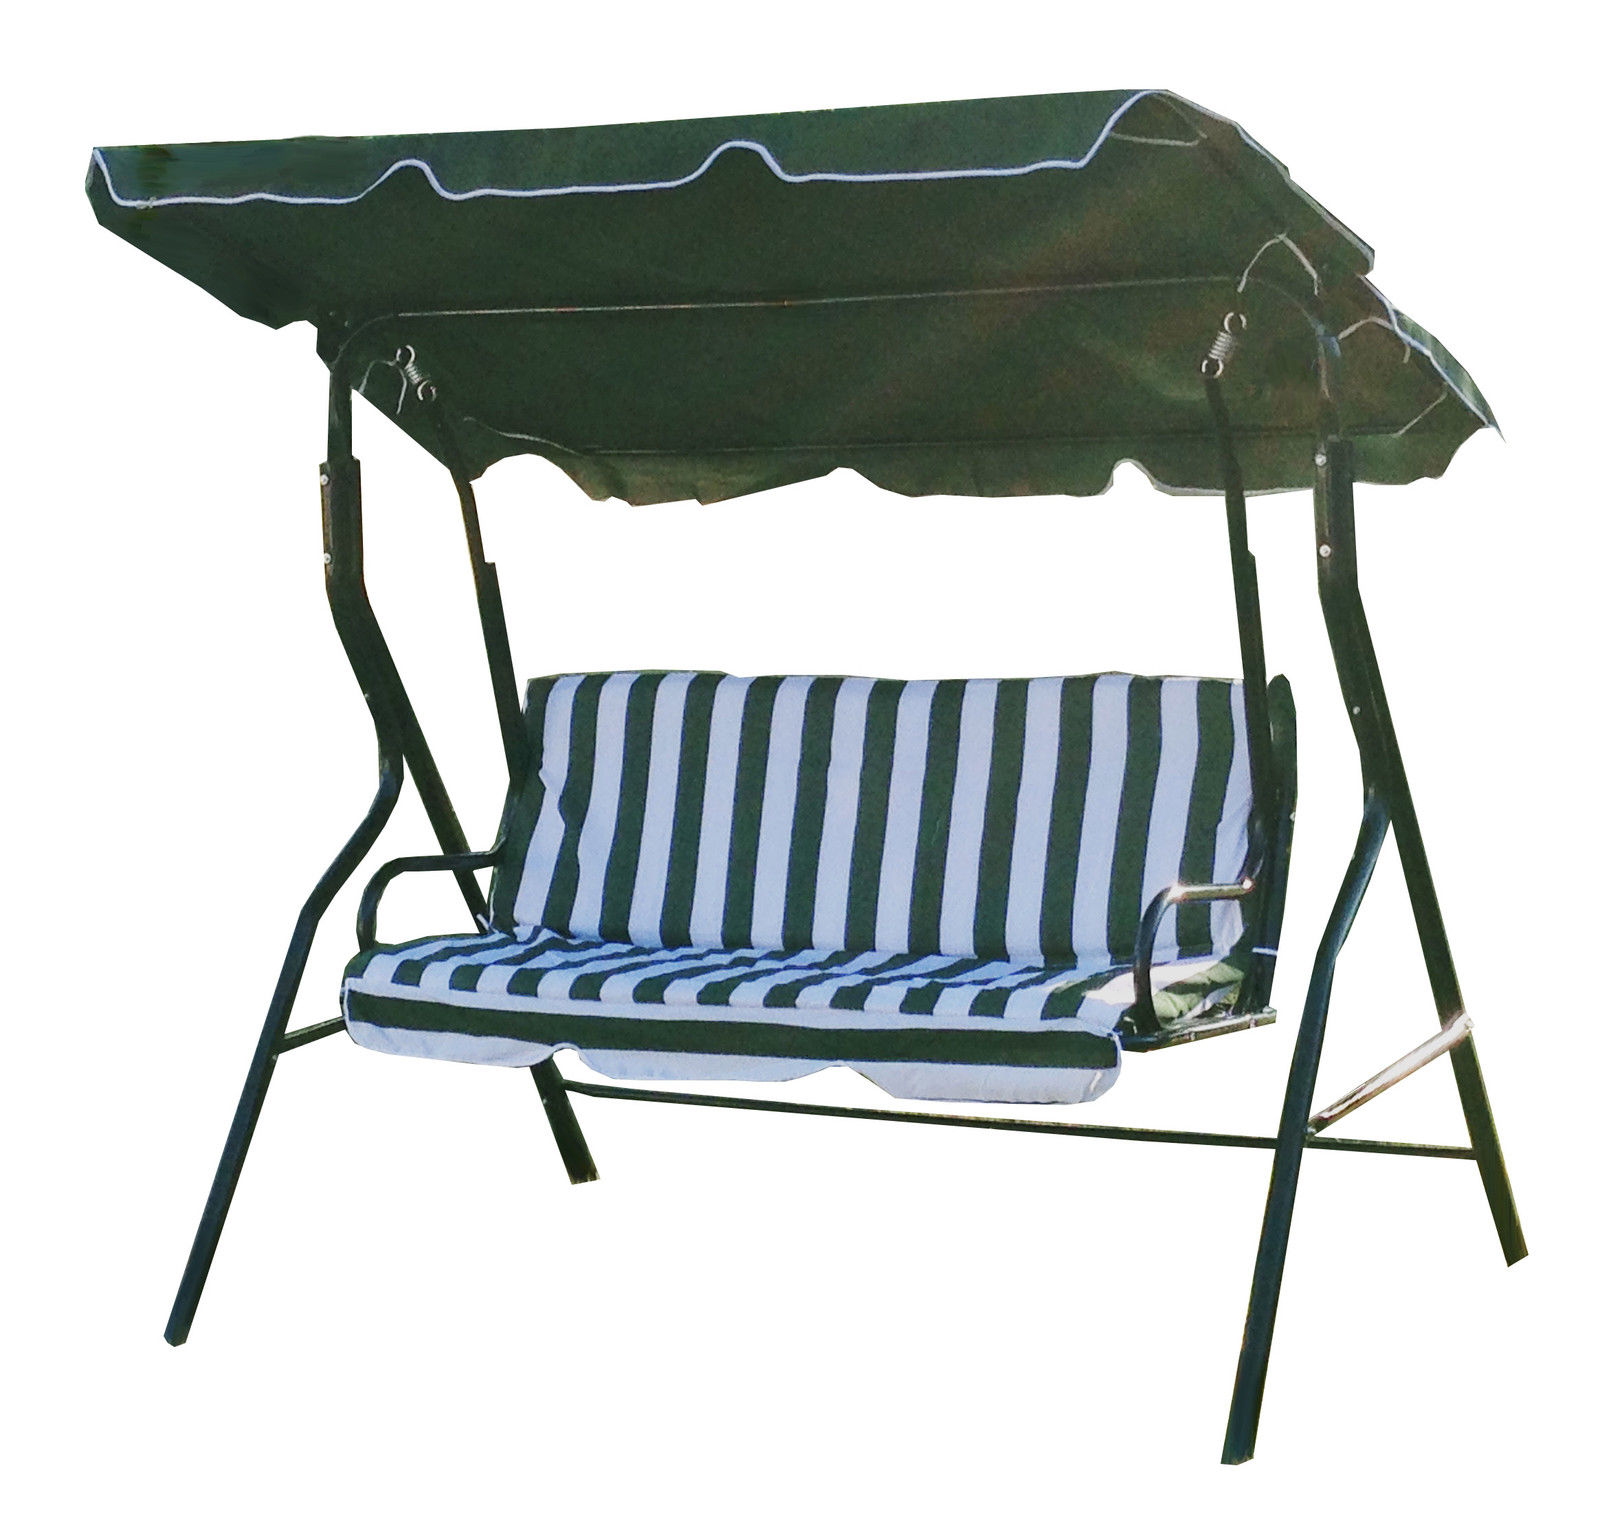 garden outdoor ellie bed pin hammock google s buy pinterest search